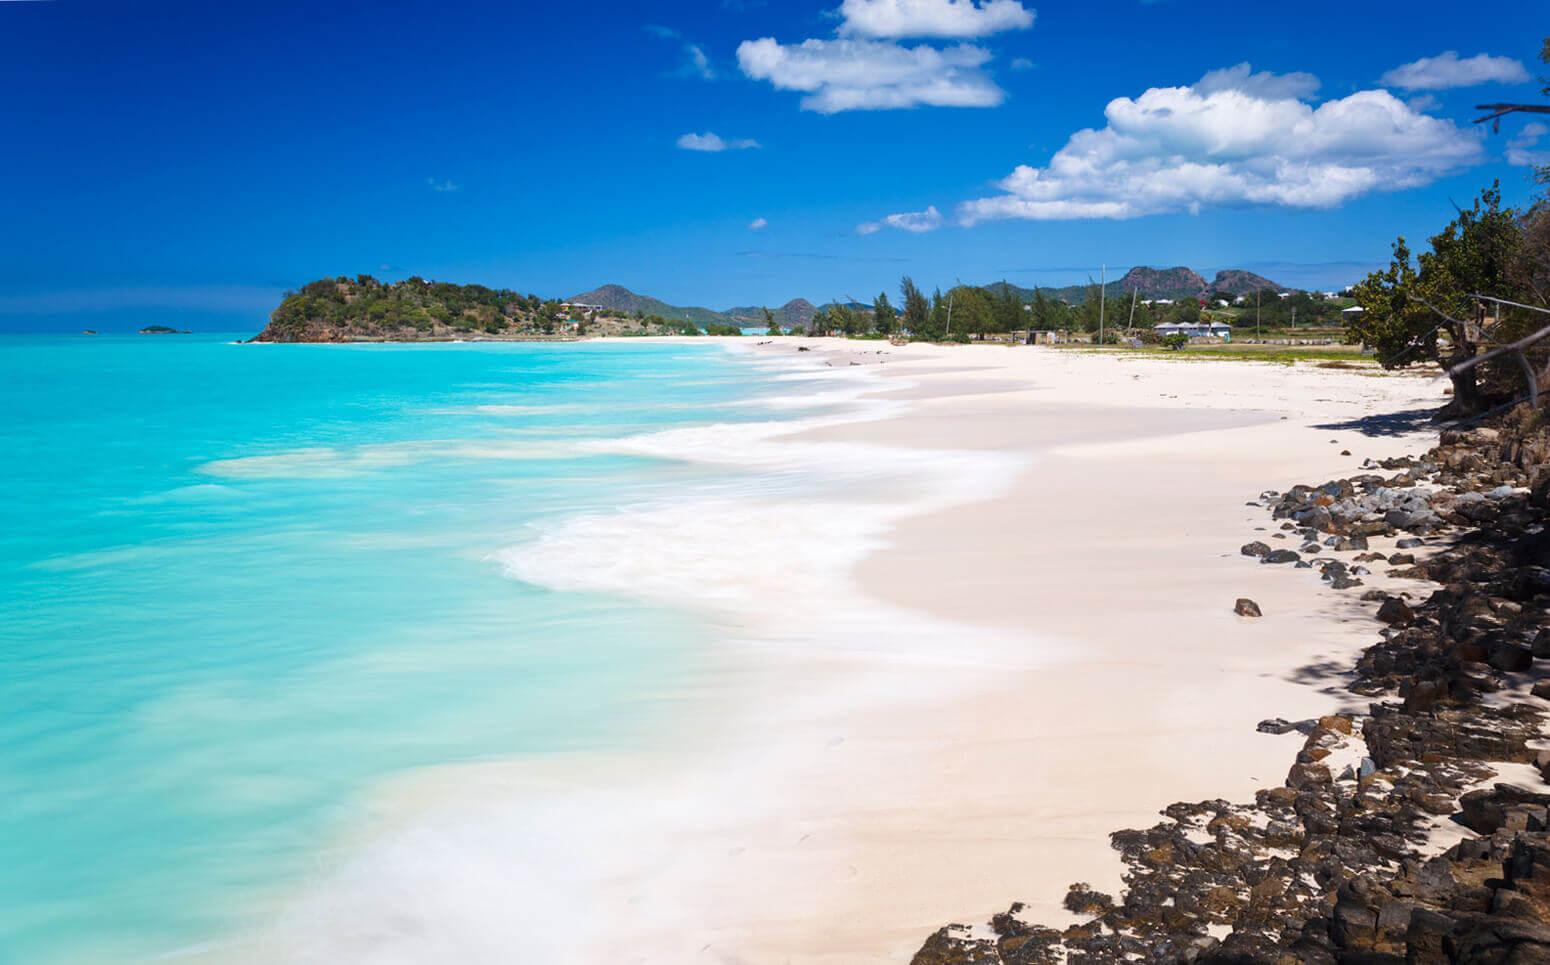 Ffryes Beach, ostrov Antiqua, Karibik